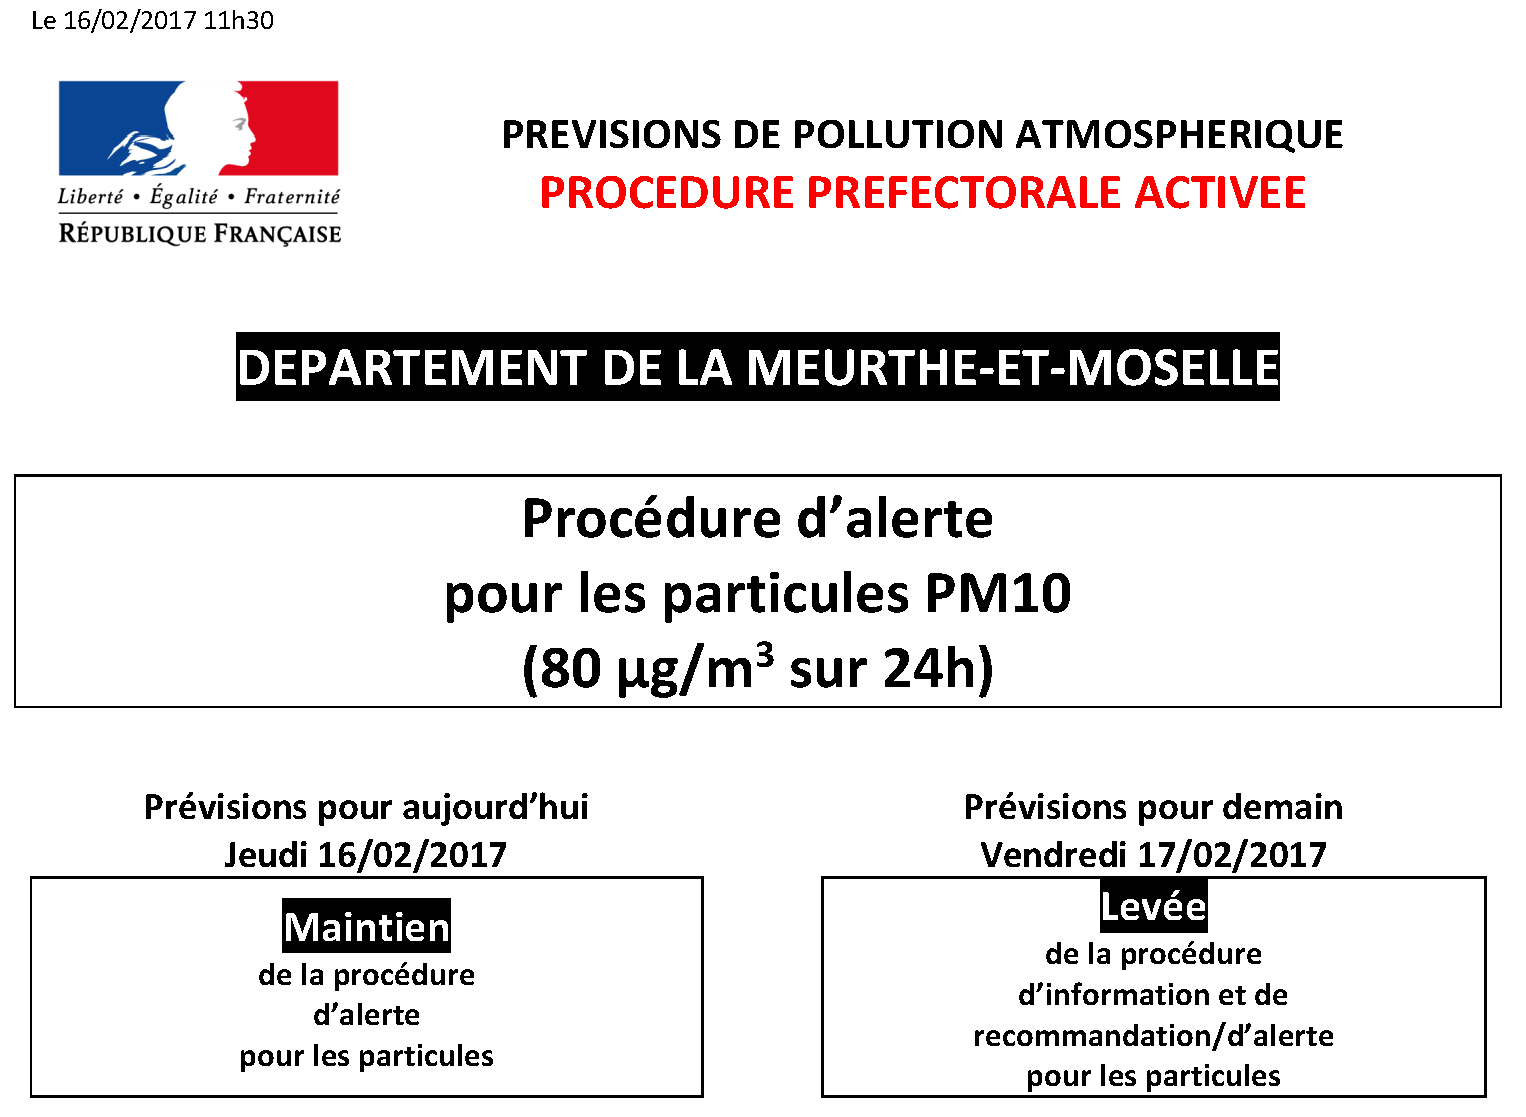 Procedure prefectorale activee chambre d 39 agriculture meurthe et moselle - Chambre d agriculture moselle ...